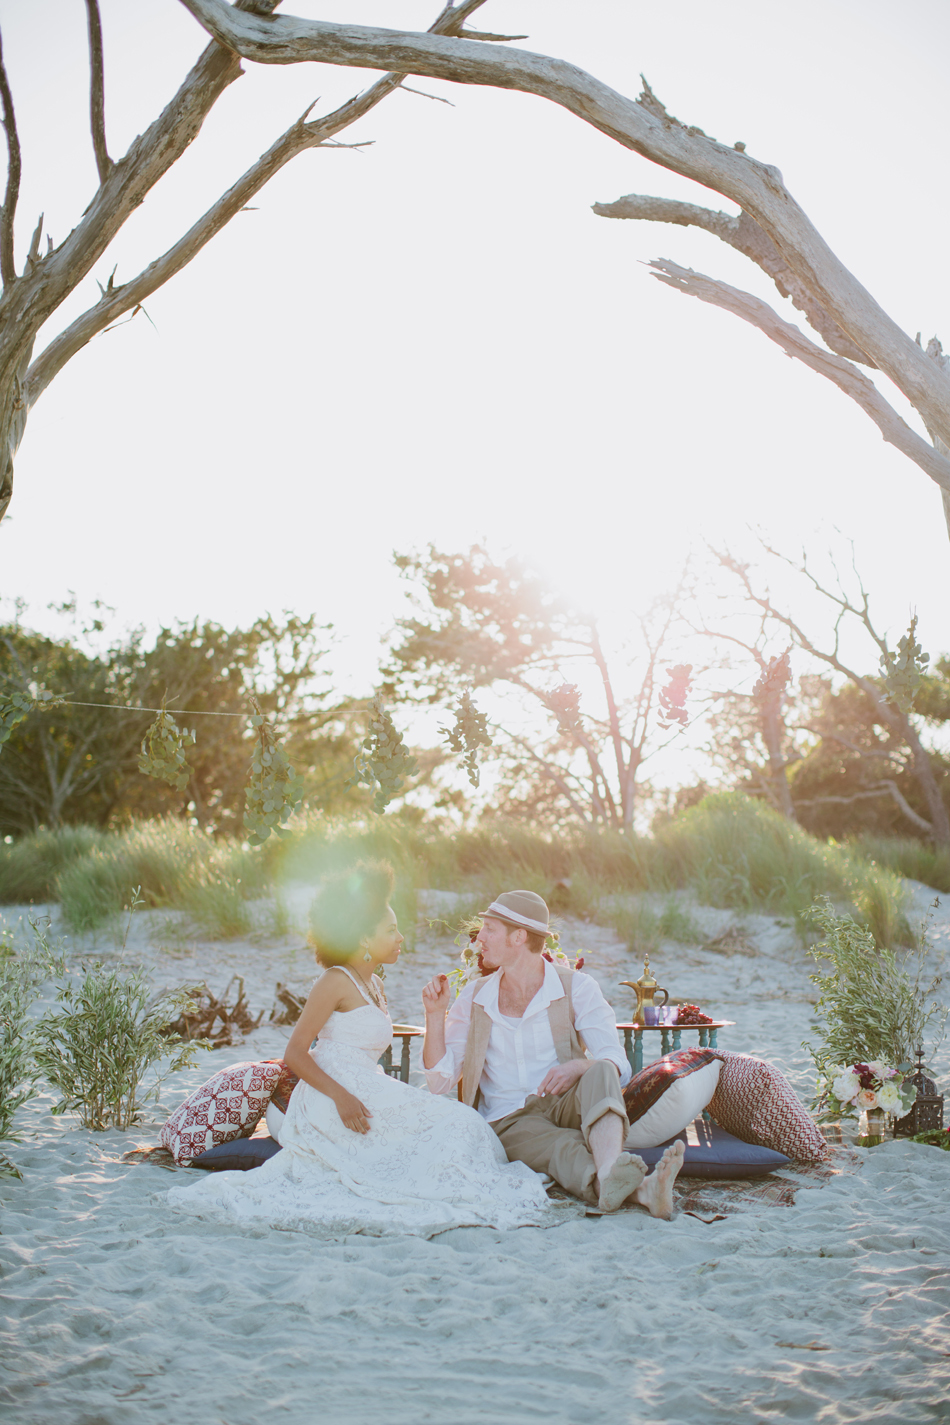 Jameykay_arlie_bohemian_elopement_styled_shoot051.jpg